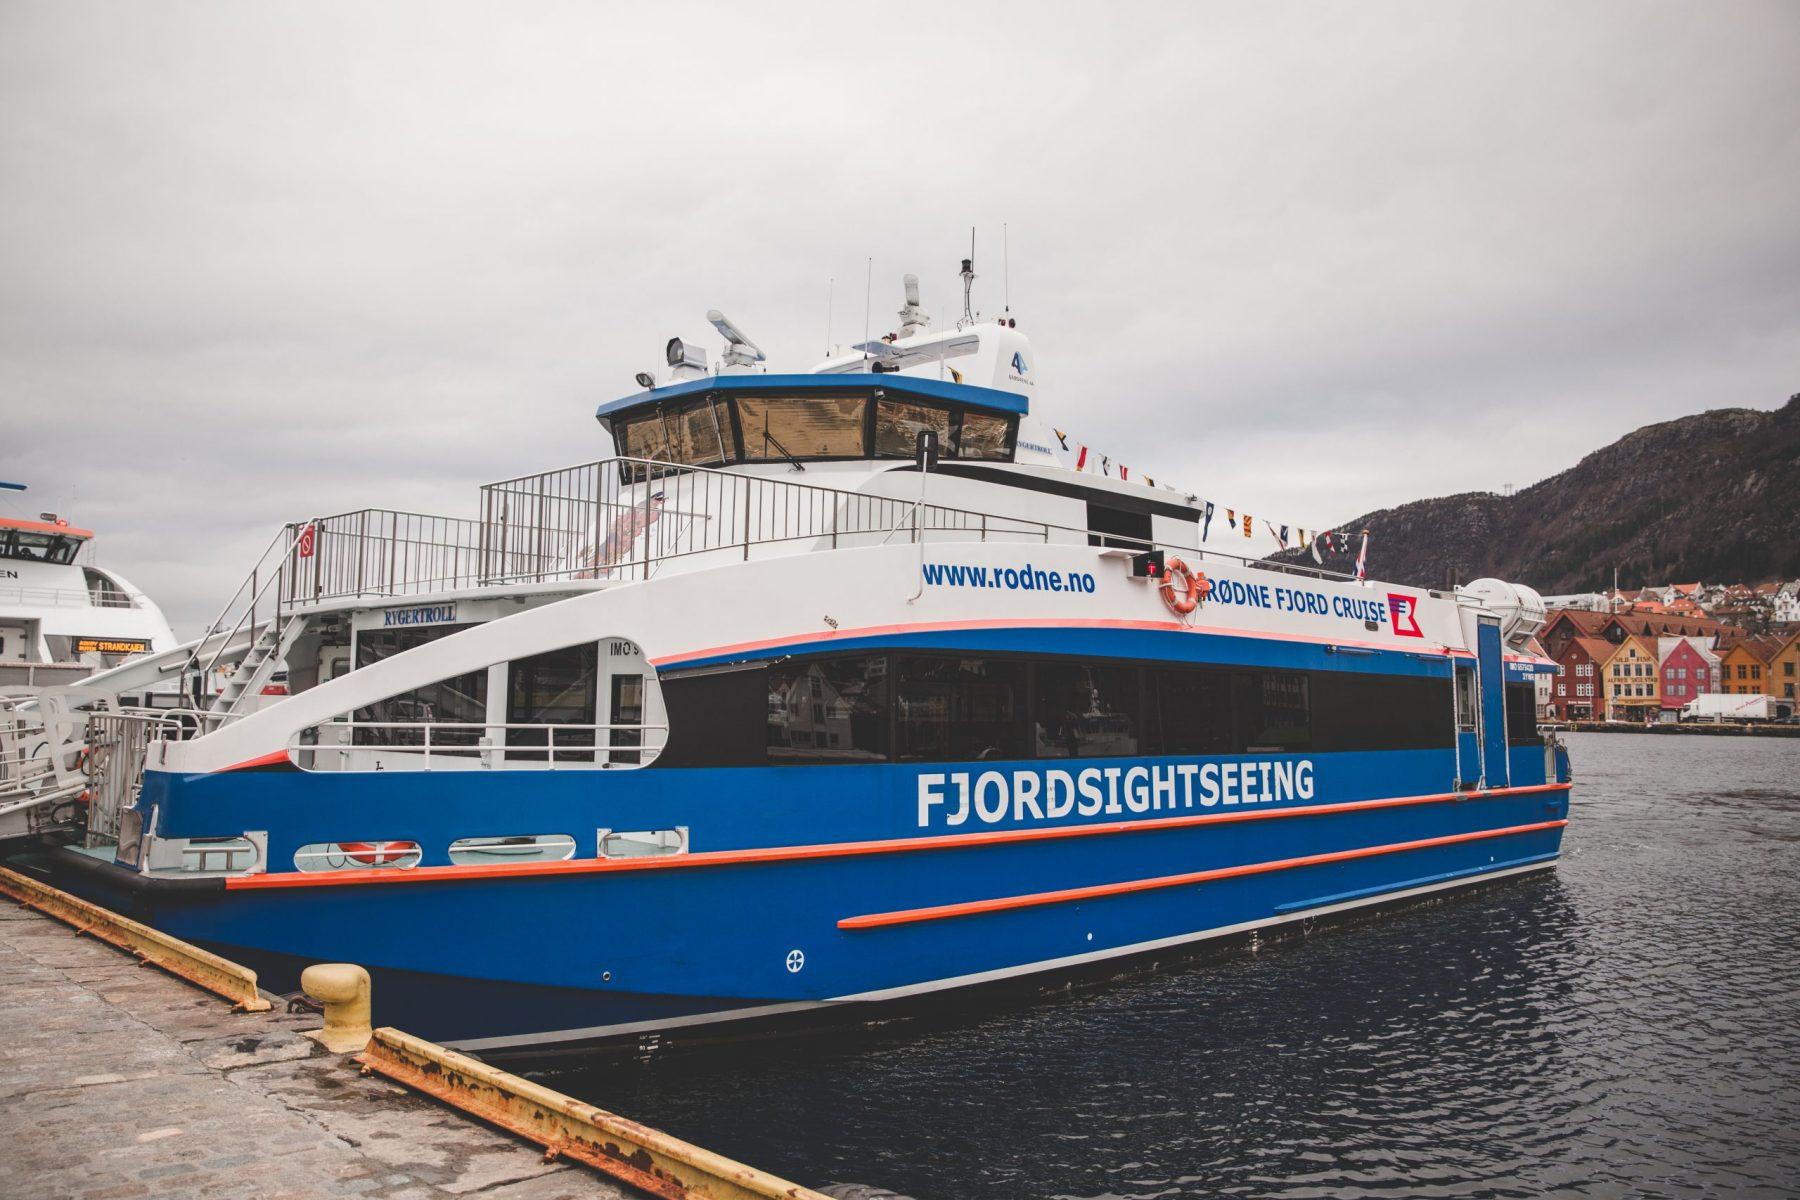 Rødne Fjord Cruise Boat in Bergen, Norway